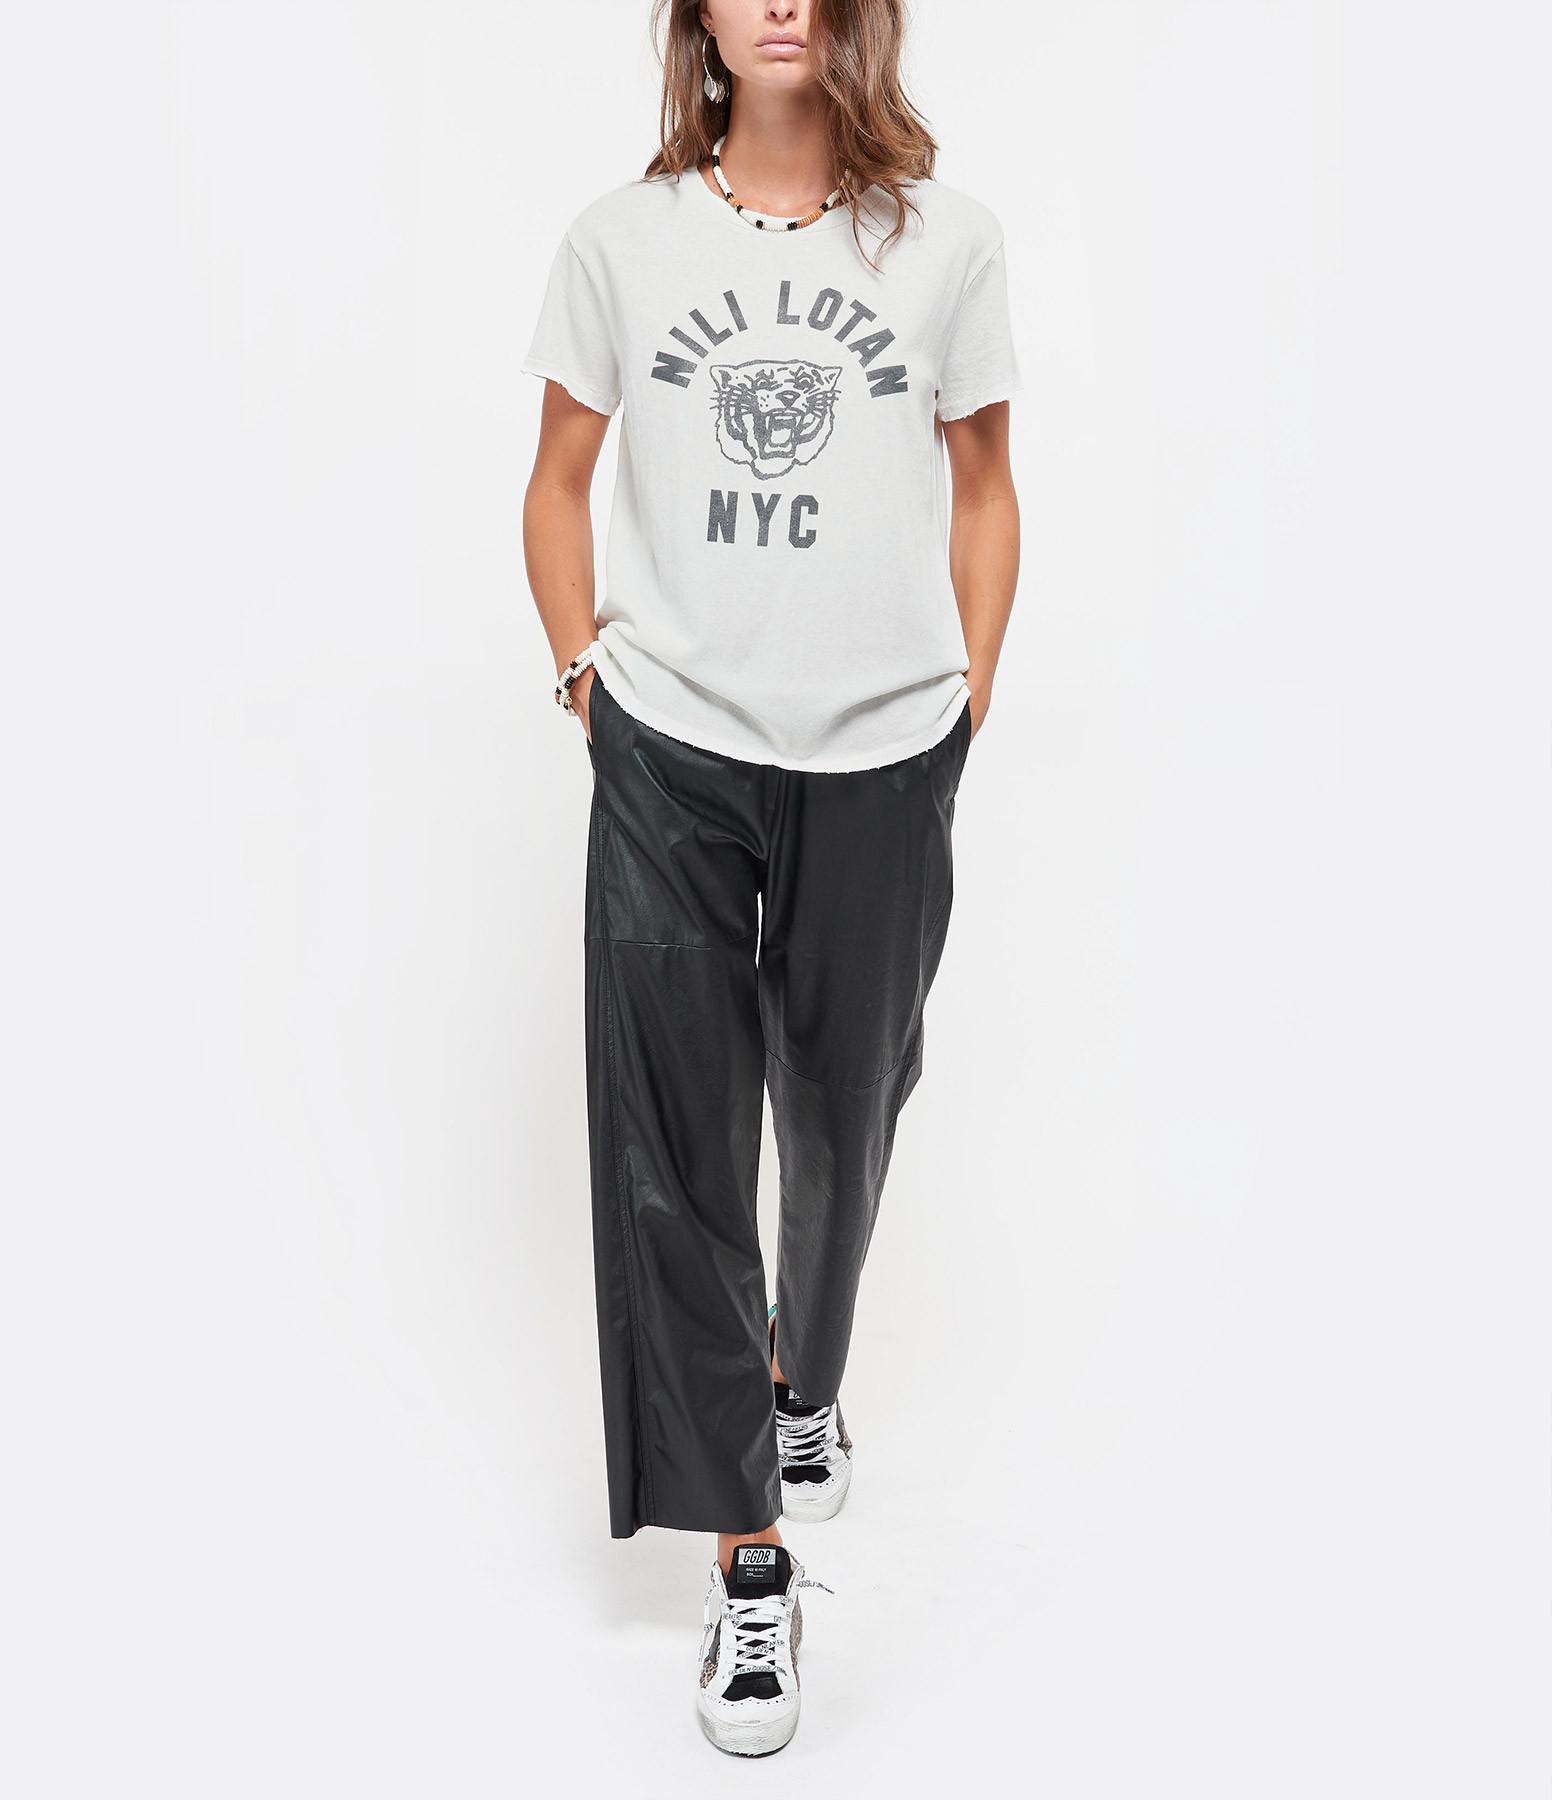 NILI LOTAN - Tee-shirt Nili Lotan NYC Écru